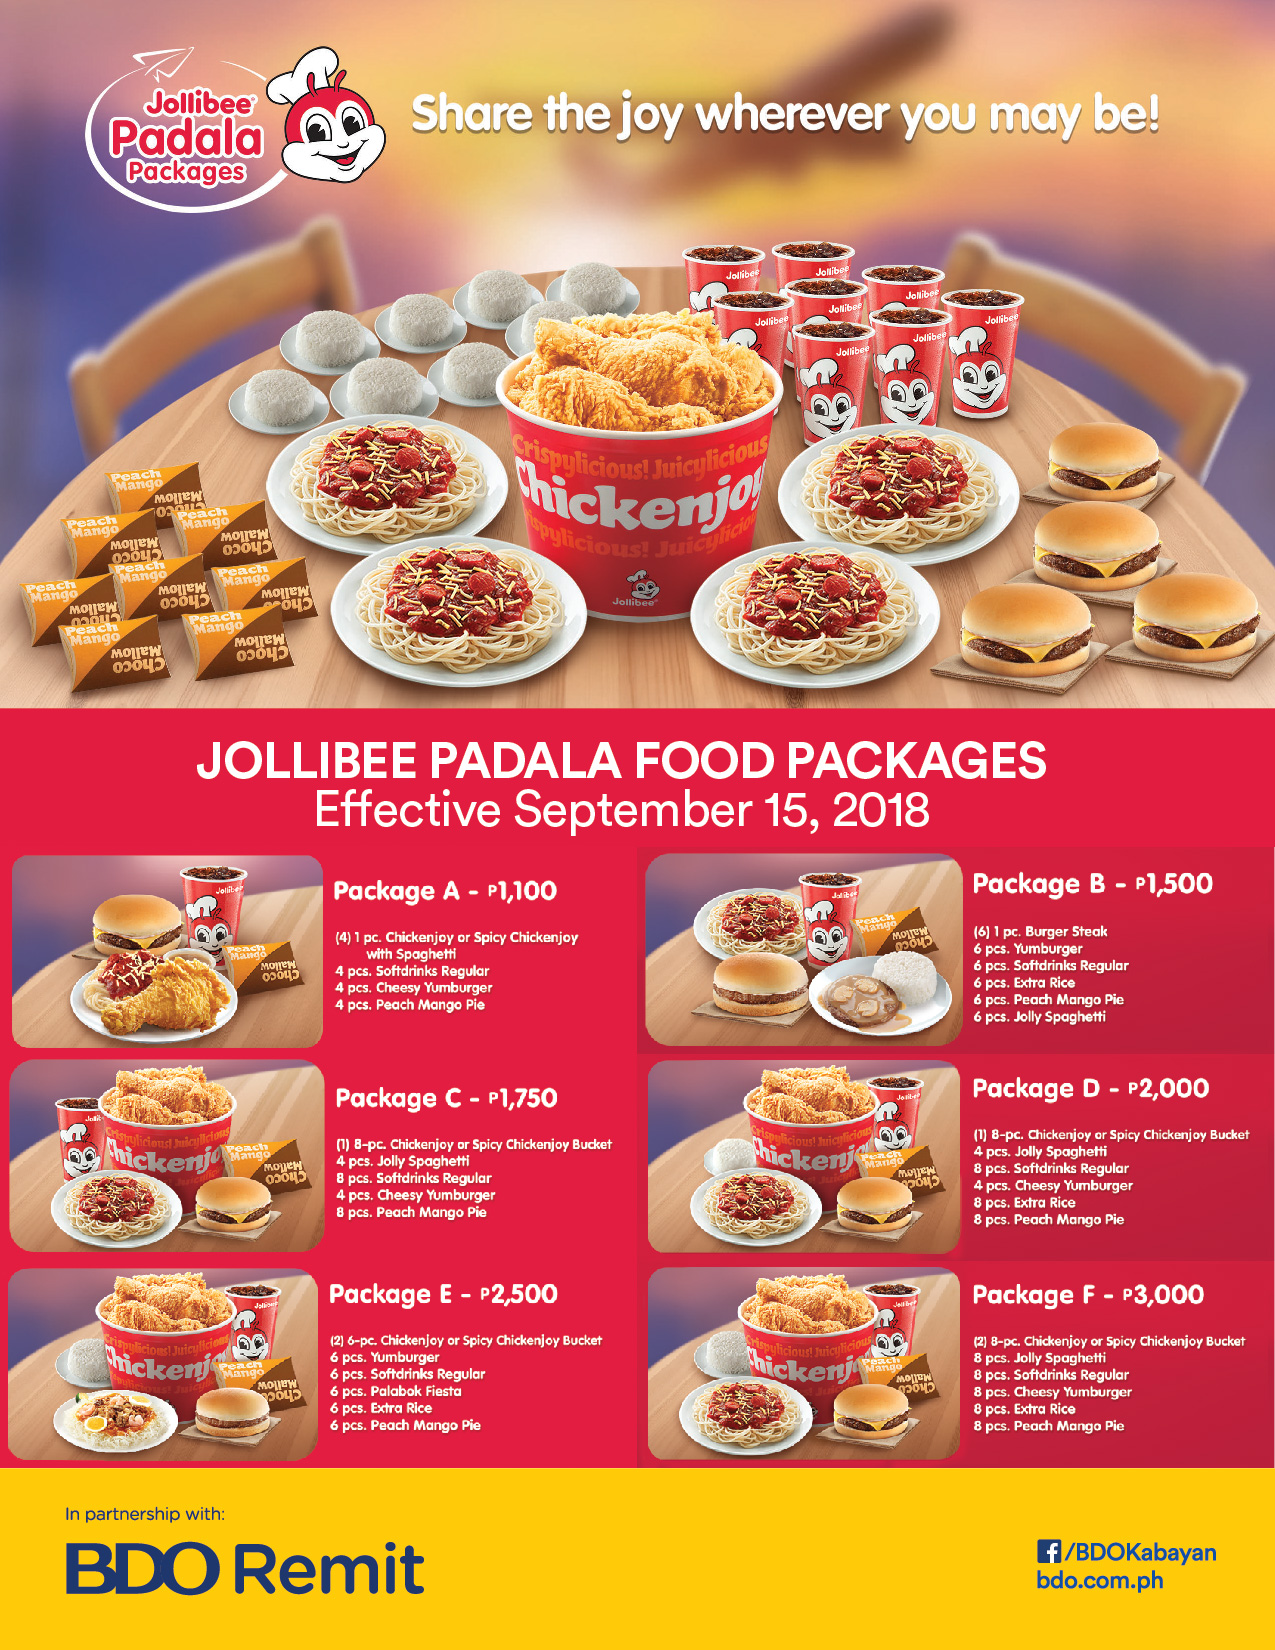 Jollibee Food Packages 2019